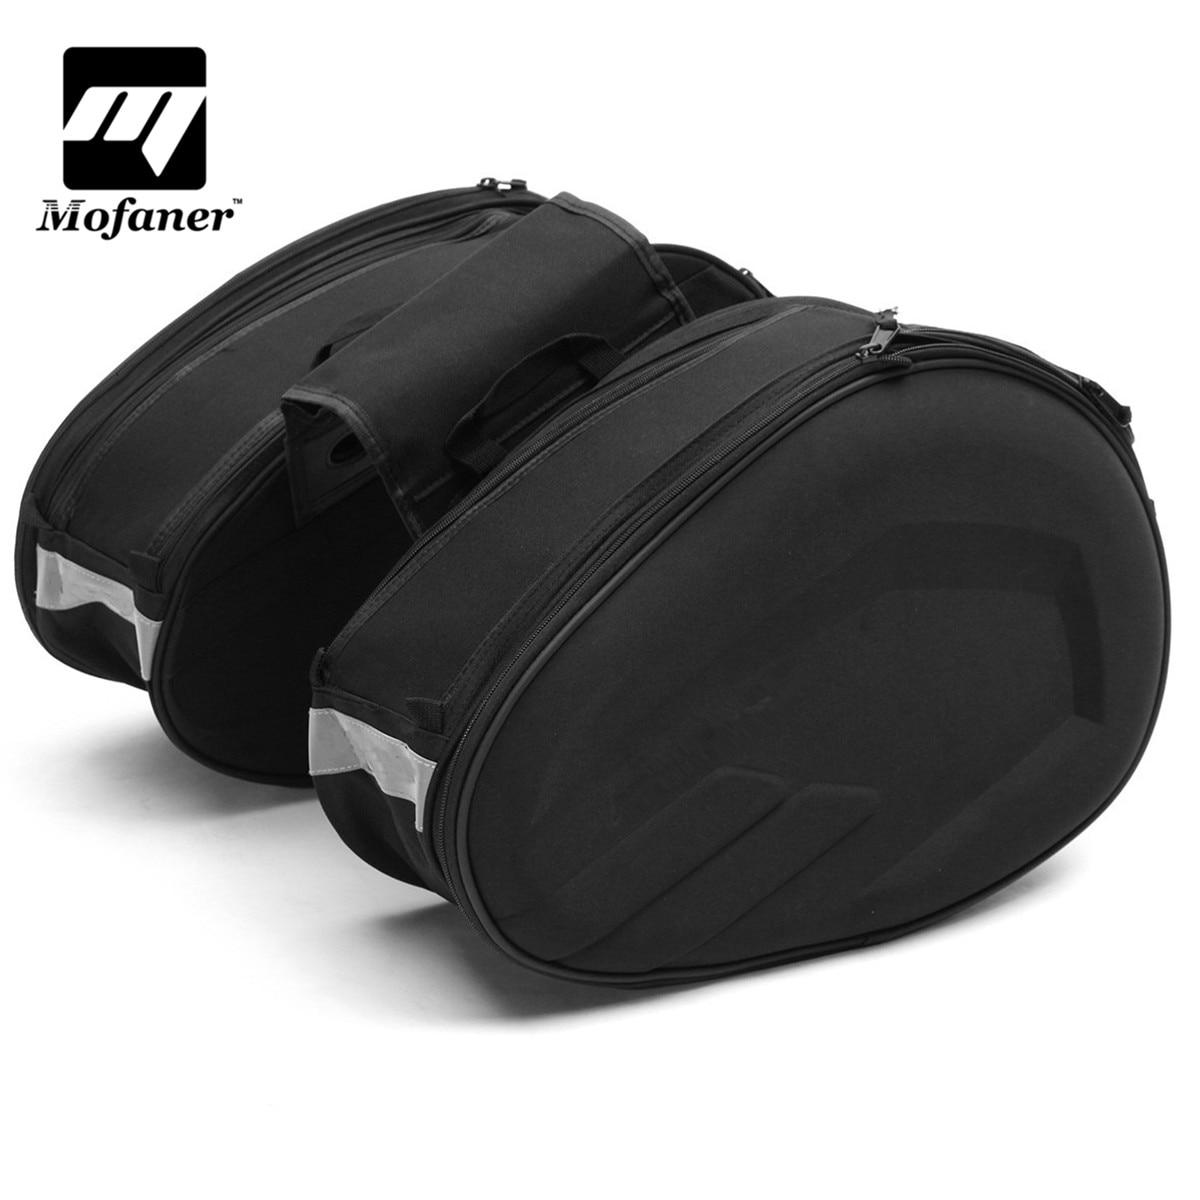 Mofaner Waterproof 58L Large Capacity Motorcycle Tool Bag Multi-use Expandable Motorbike Rear Seat Luggage Saddle Bag